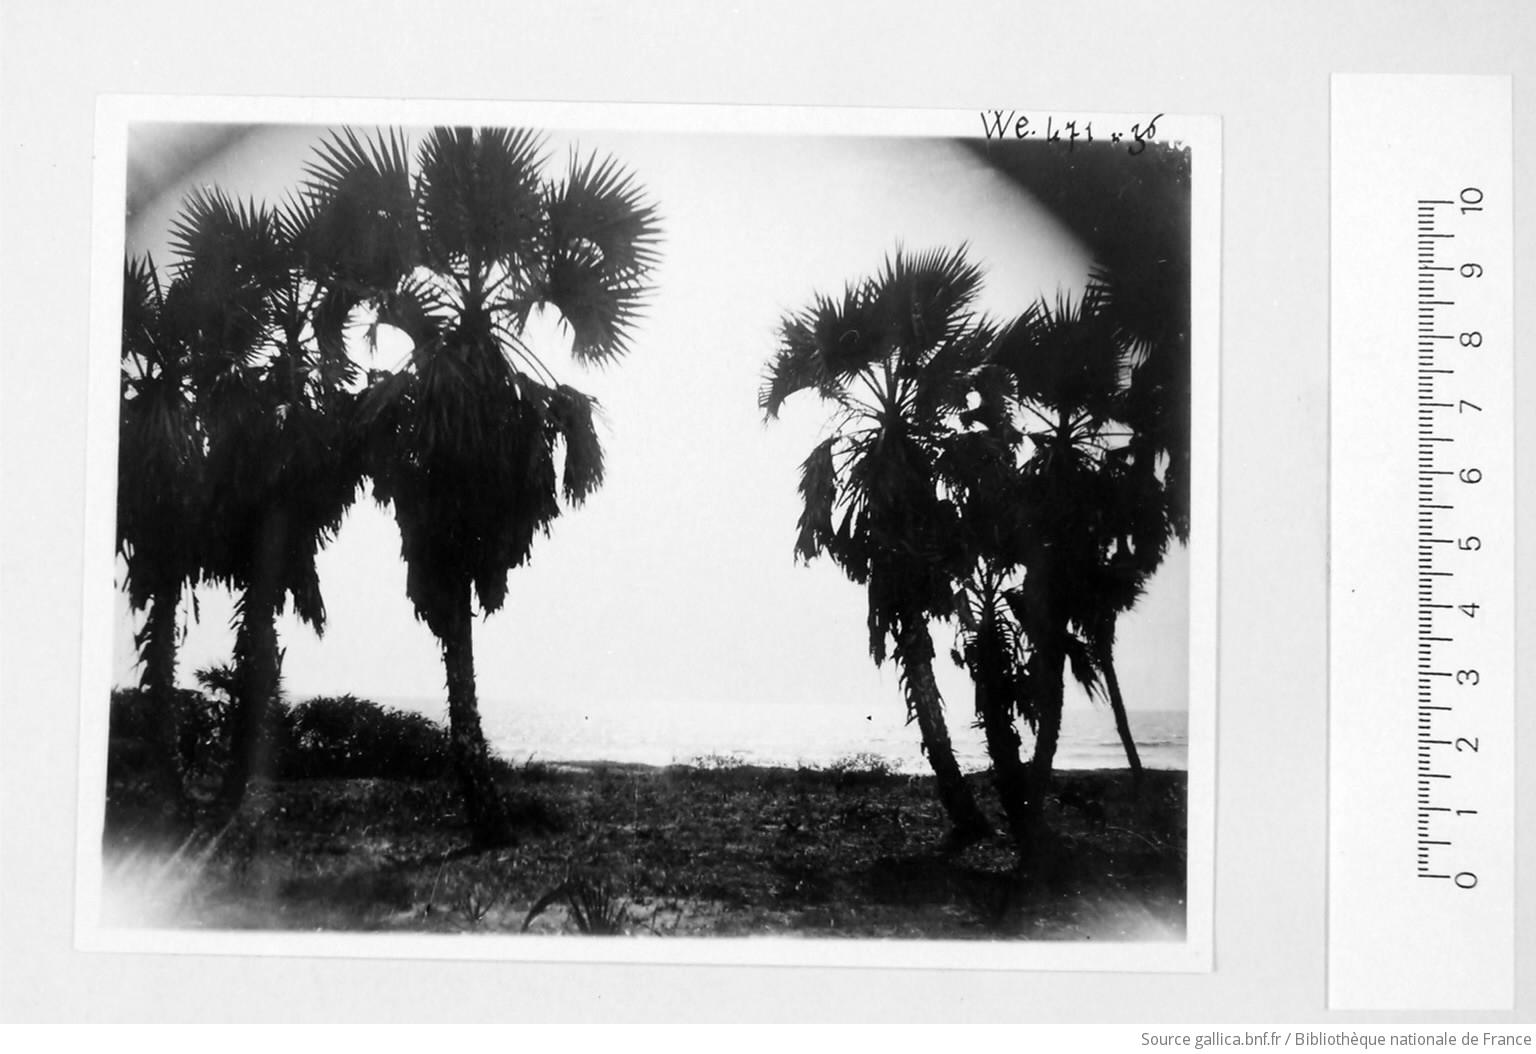 [39 phot. d'A.E.F. en 1924. Enregistré en 1936] - 34